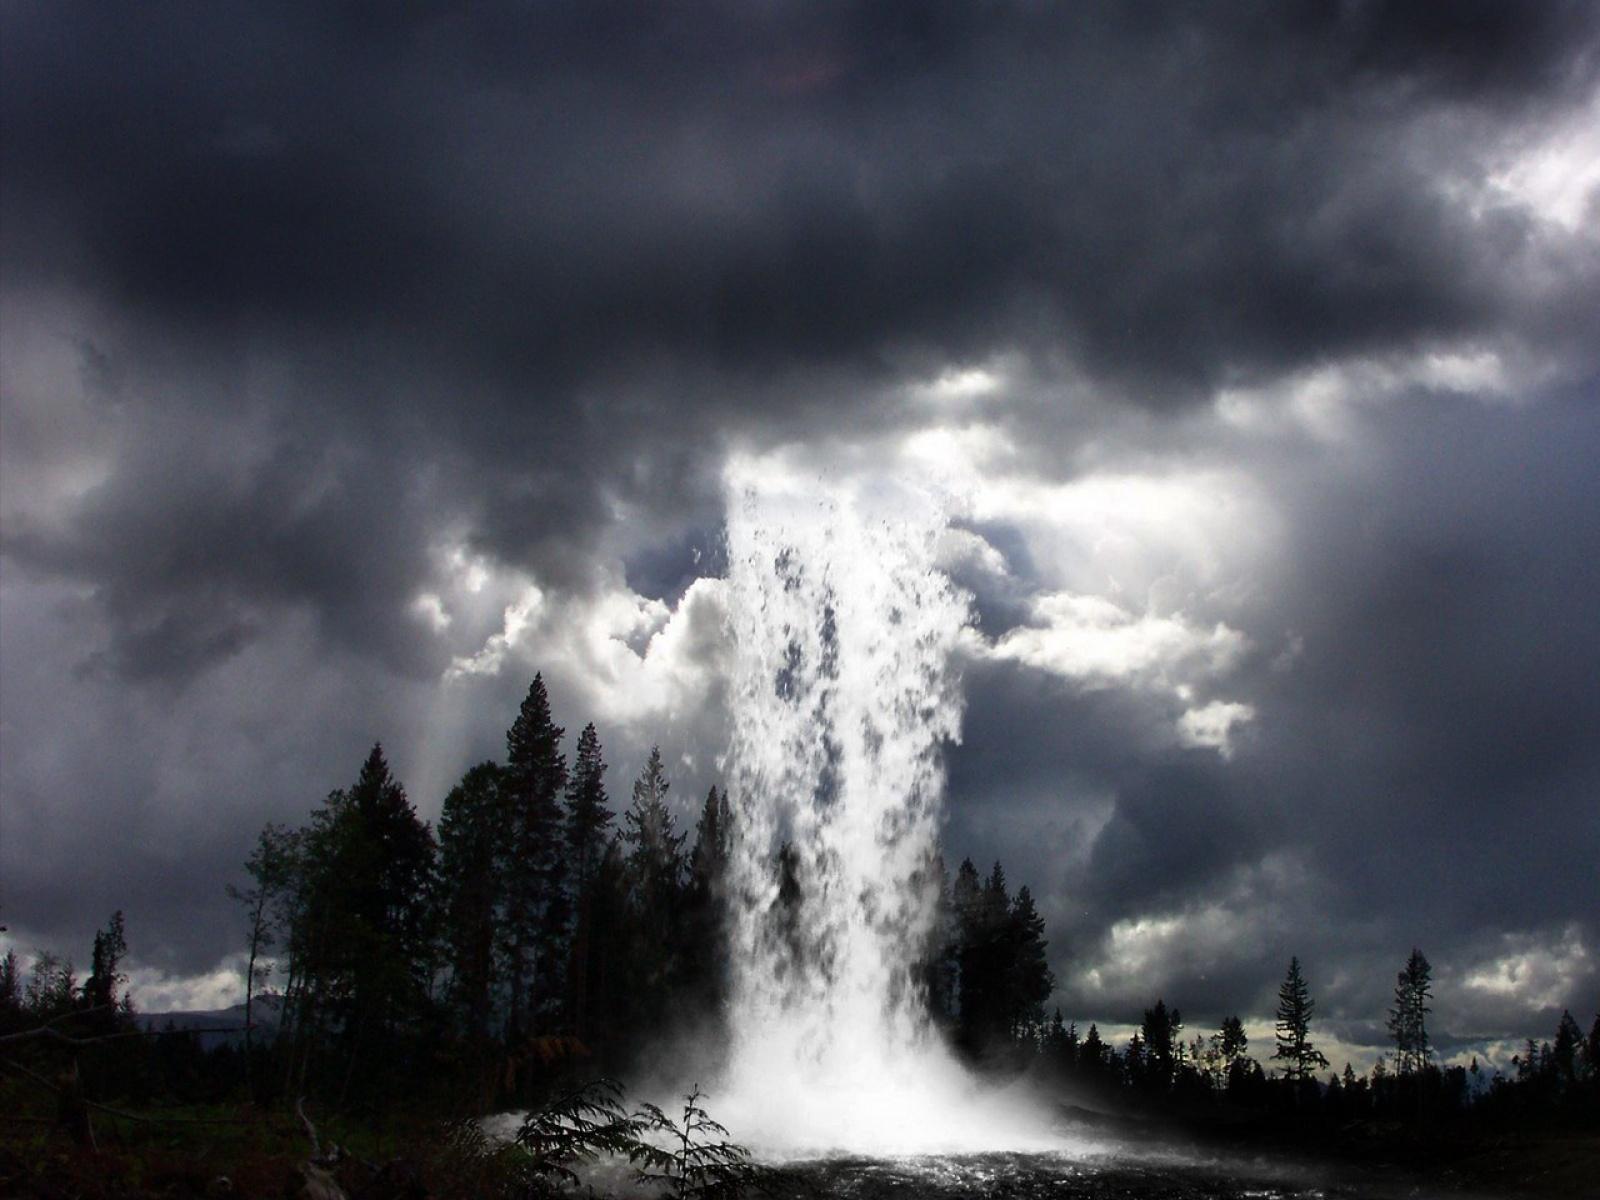 Fond d'ecran Cascade d'eau du ciel